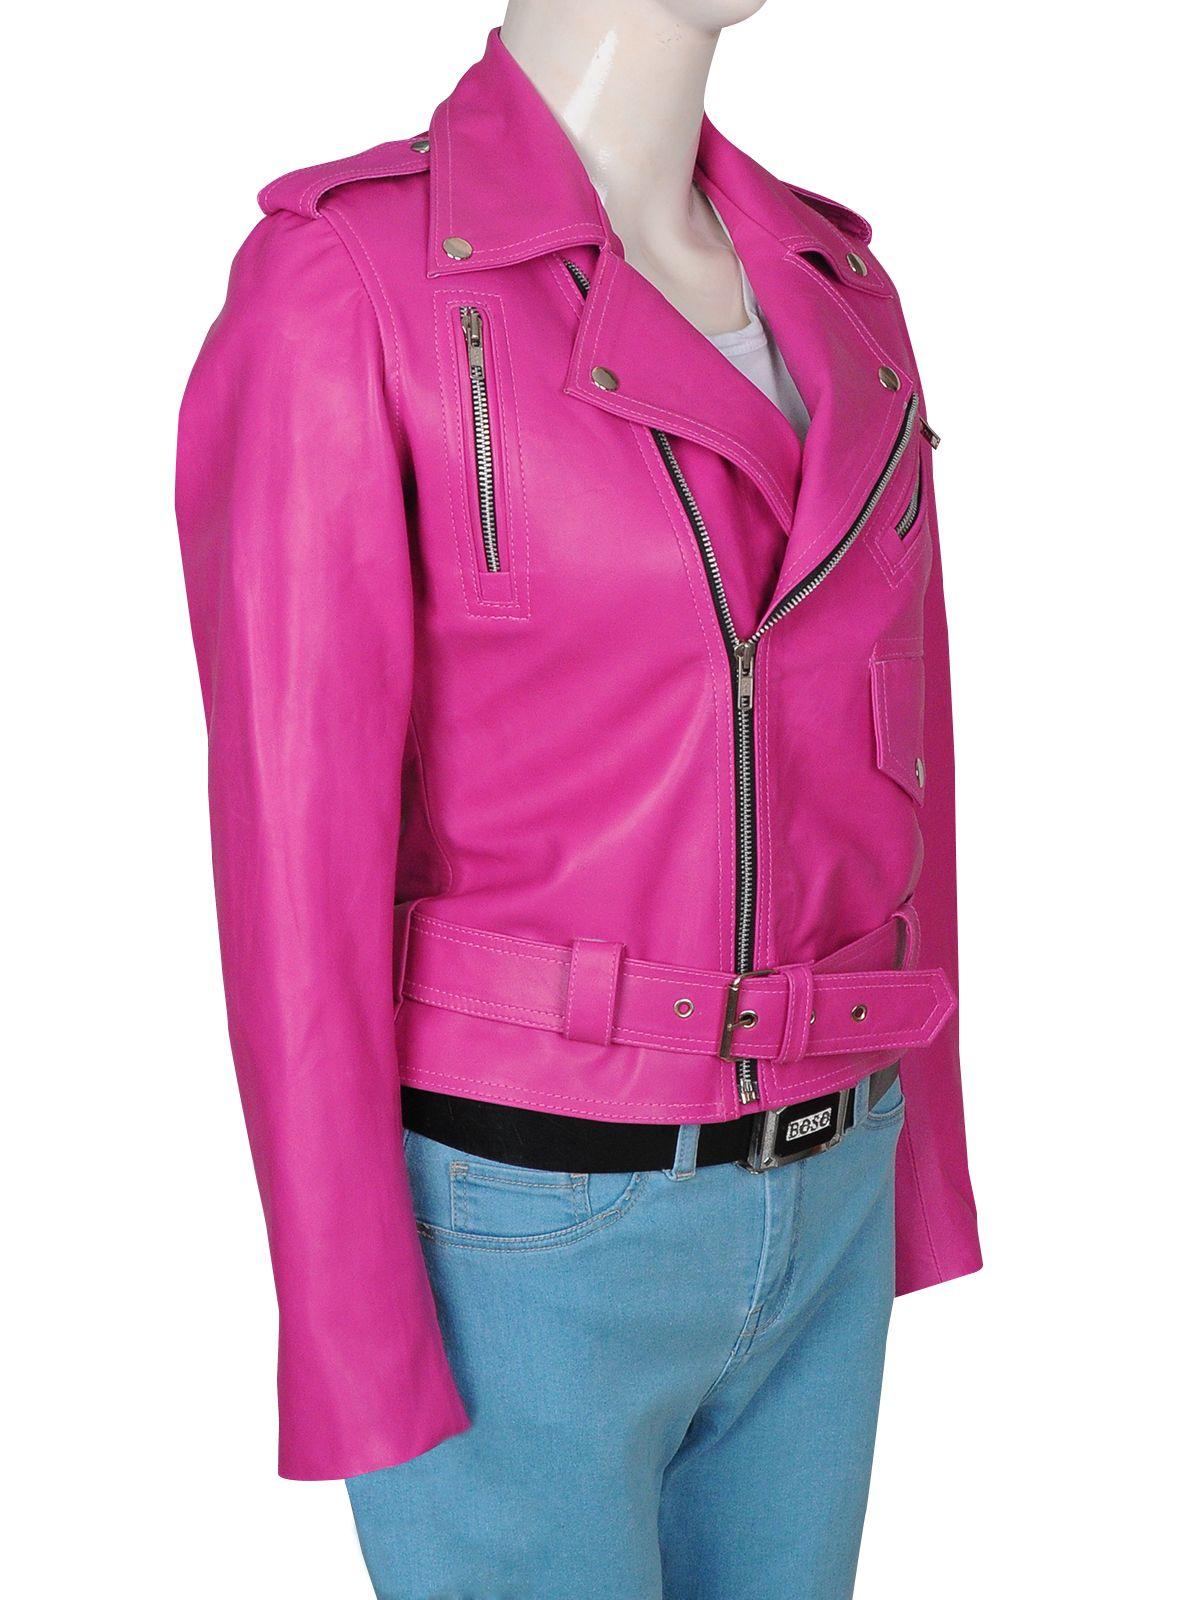 87b164d08 Fucshia Pink Hot Girl Leather Jacket